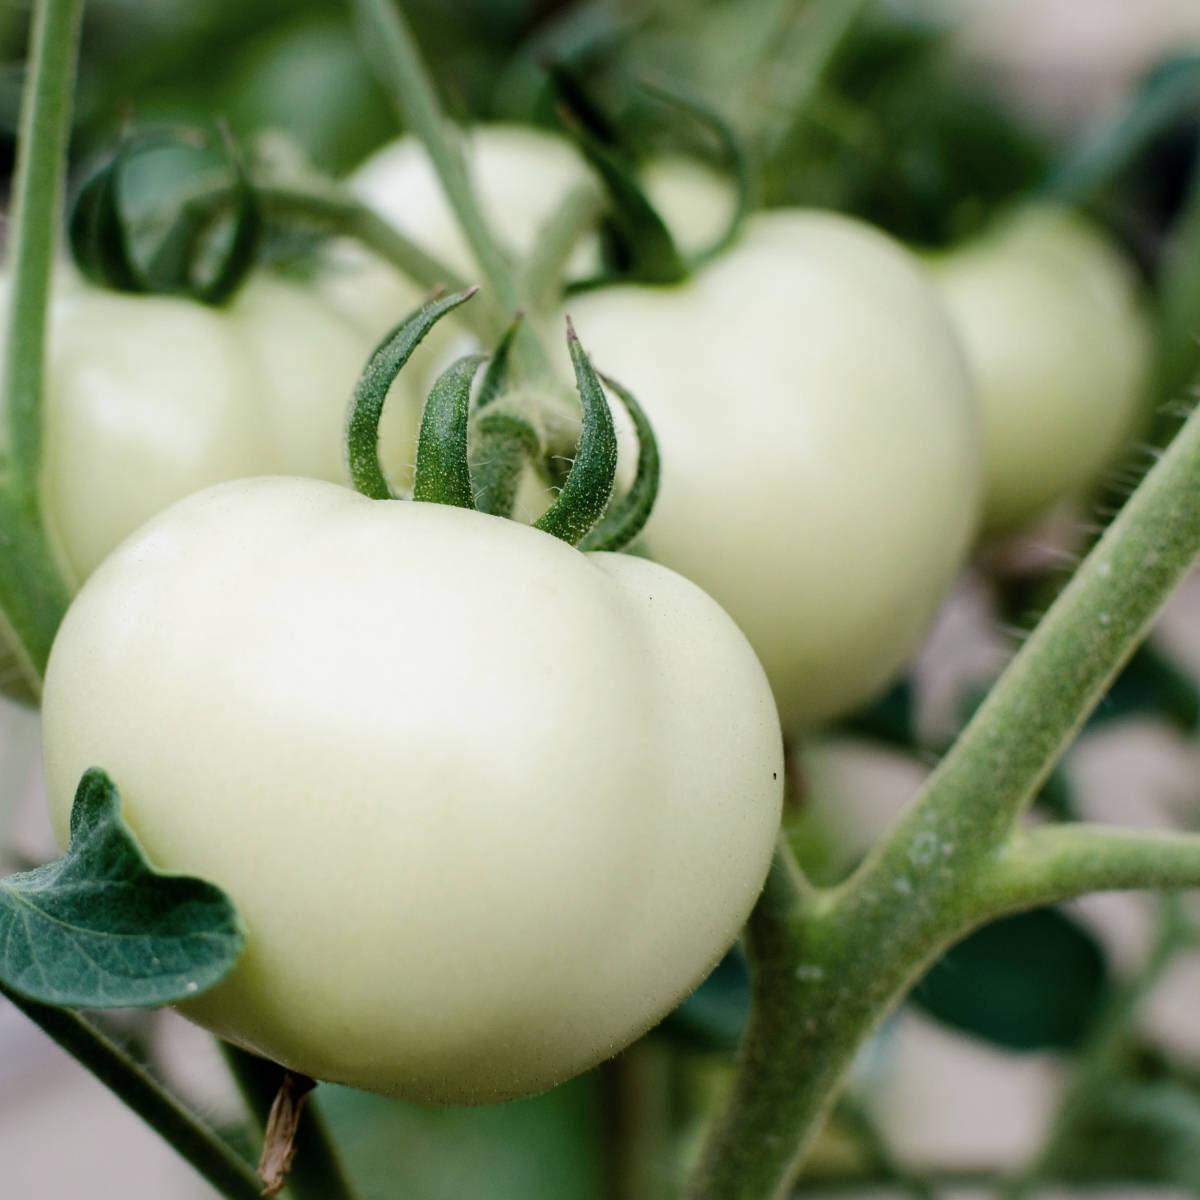 White Tomato Extract